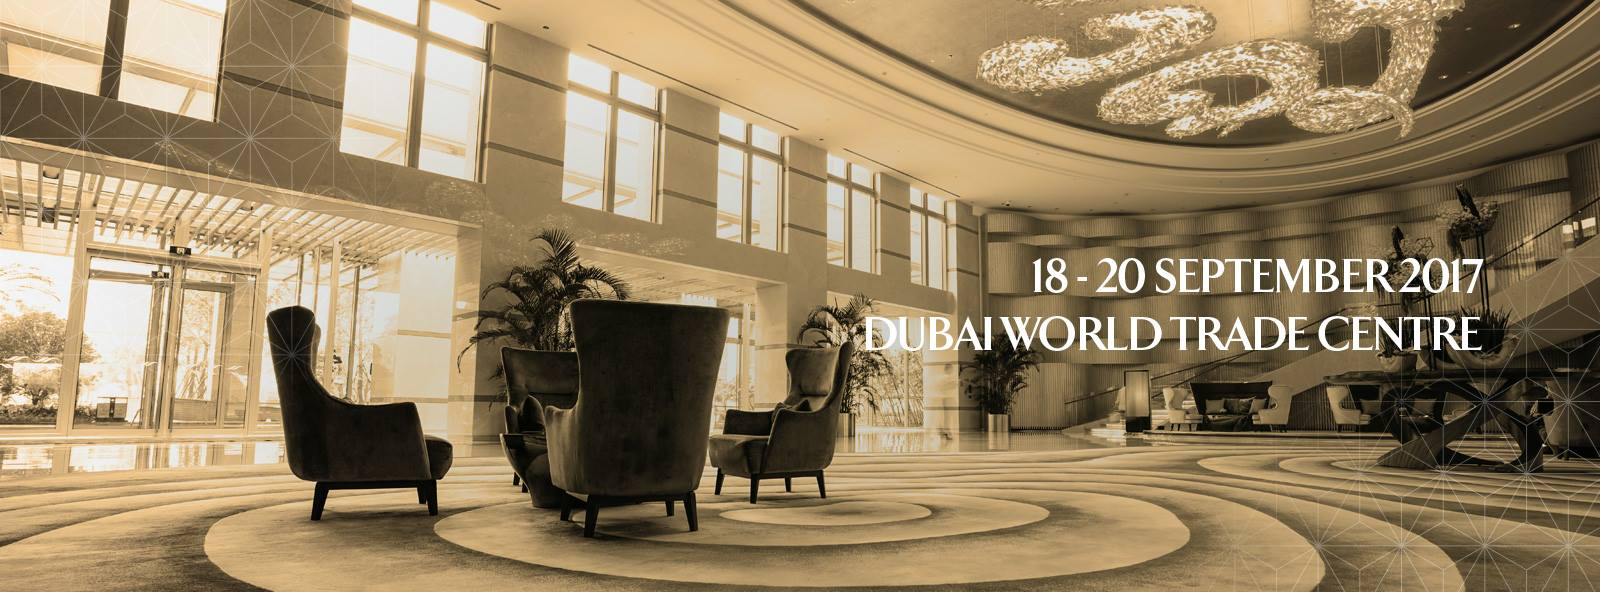 The Hotel Show Dubai 2017